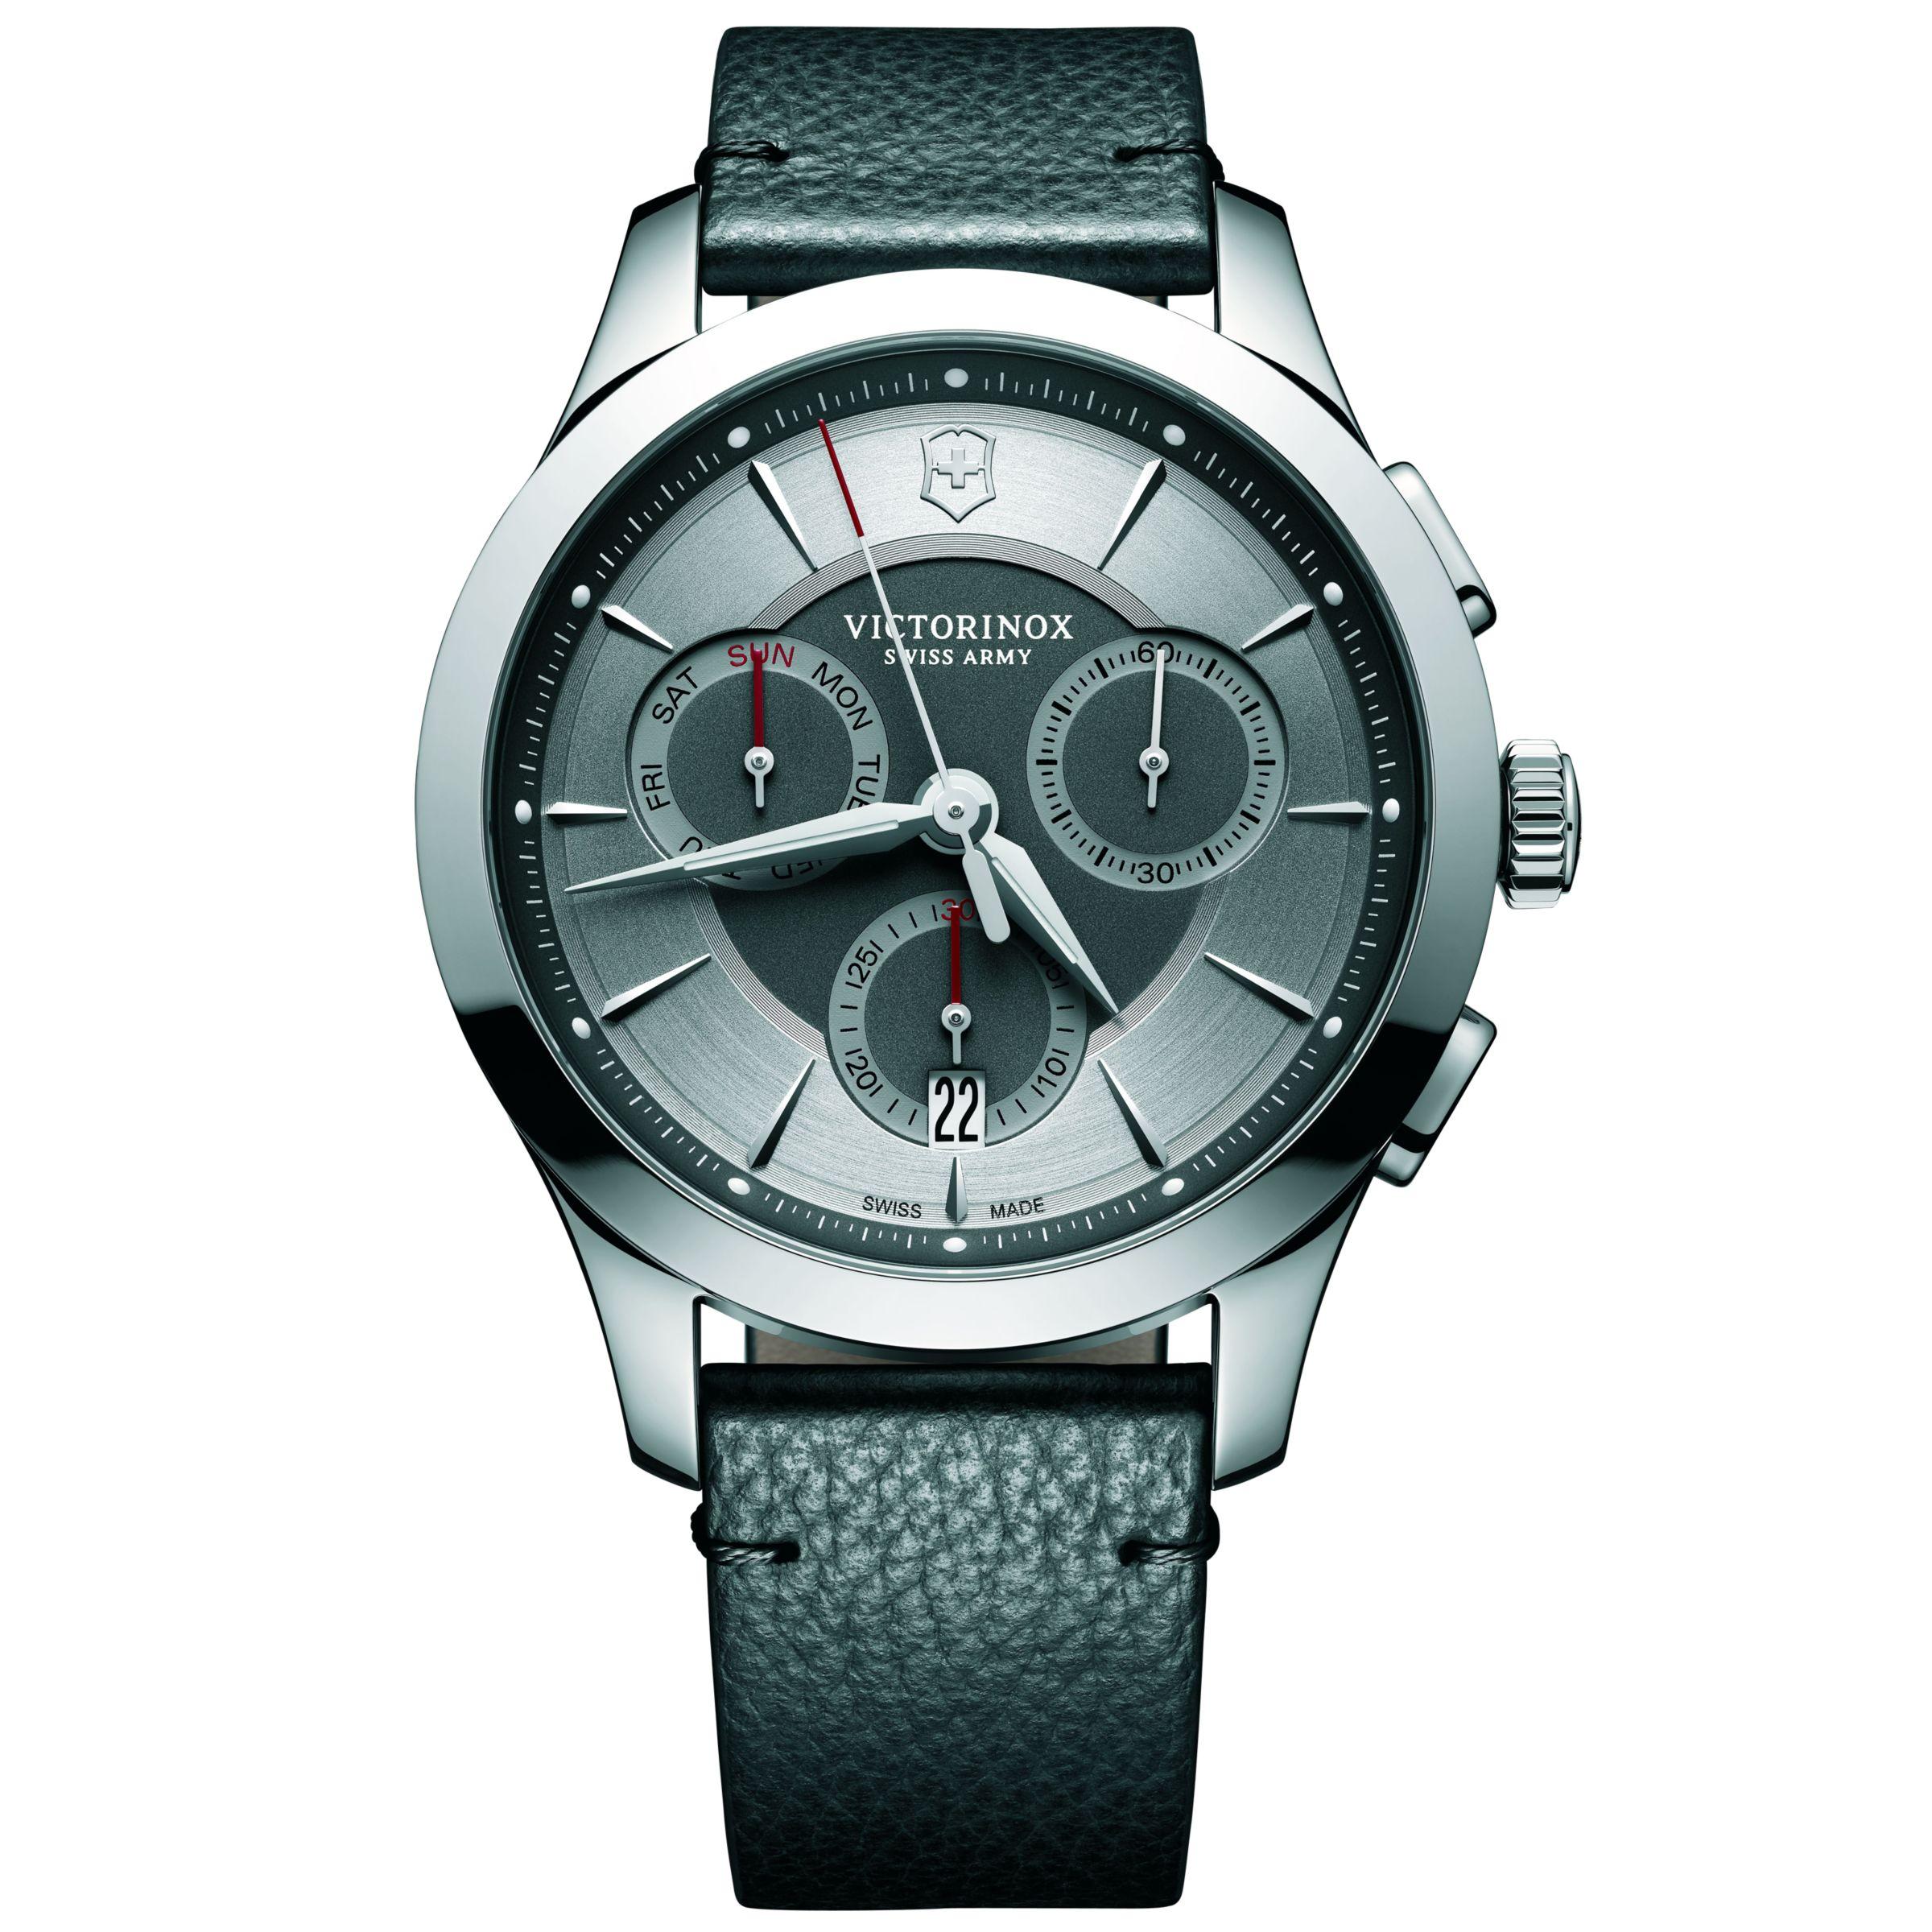 Victorinox Victorinox 241748 Men's Alliance Chronograph Day Date Leather Strap Watch, Black/Silver